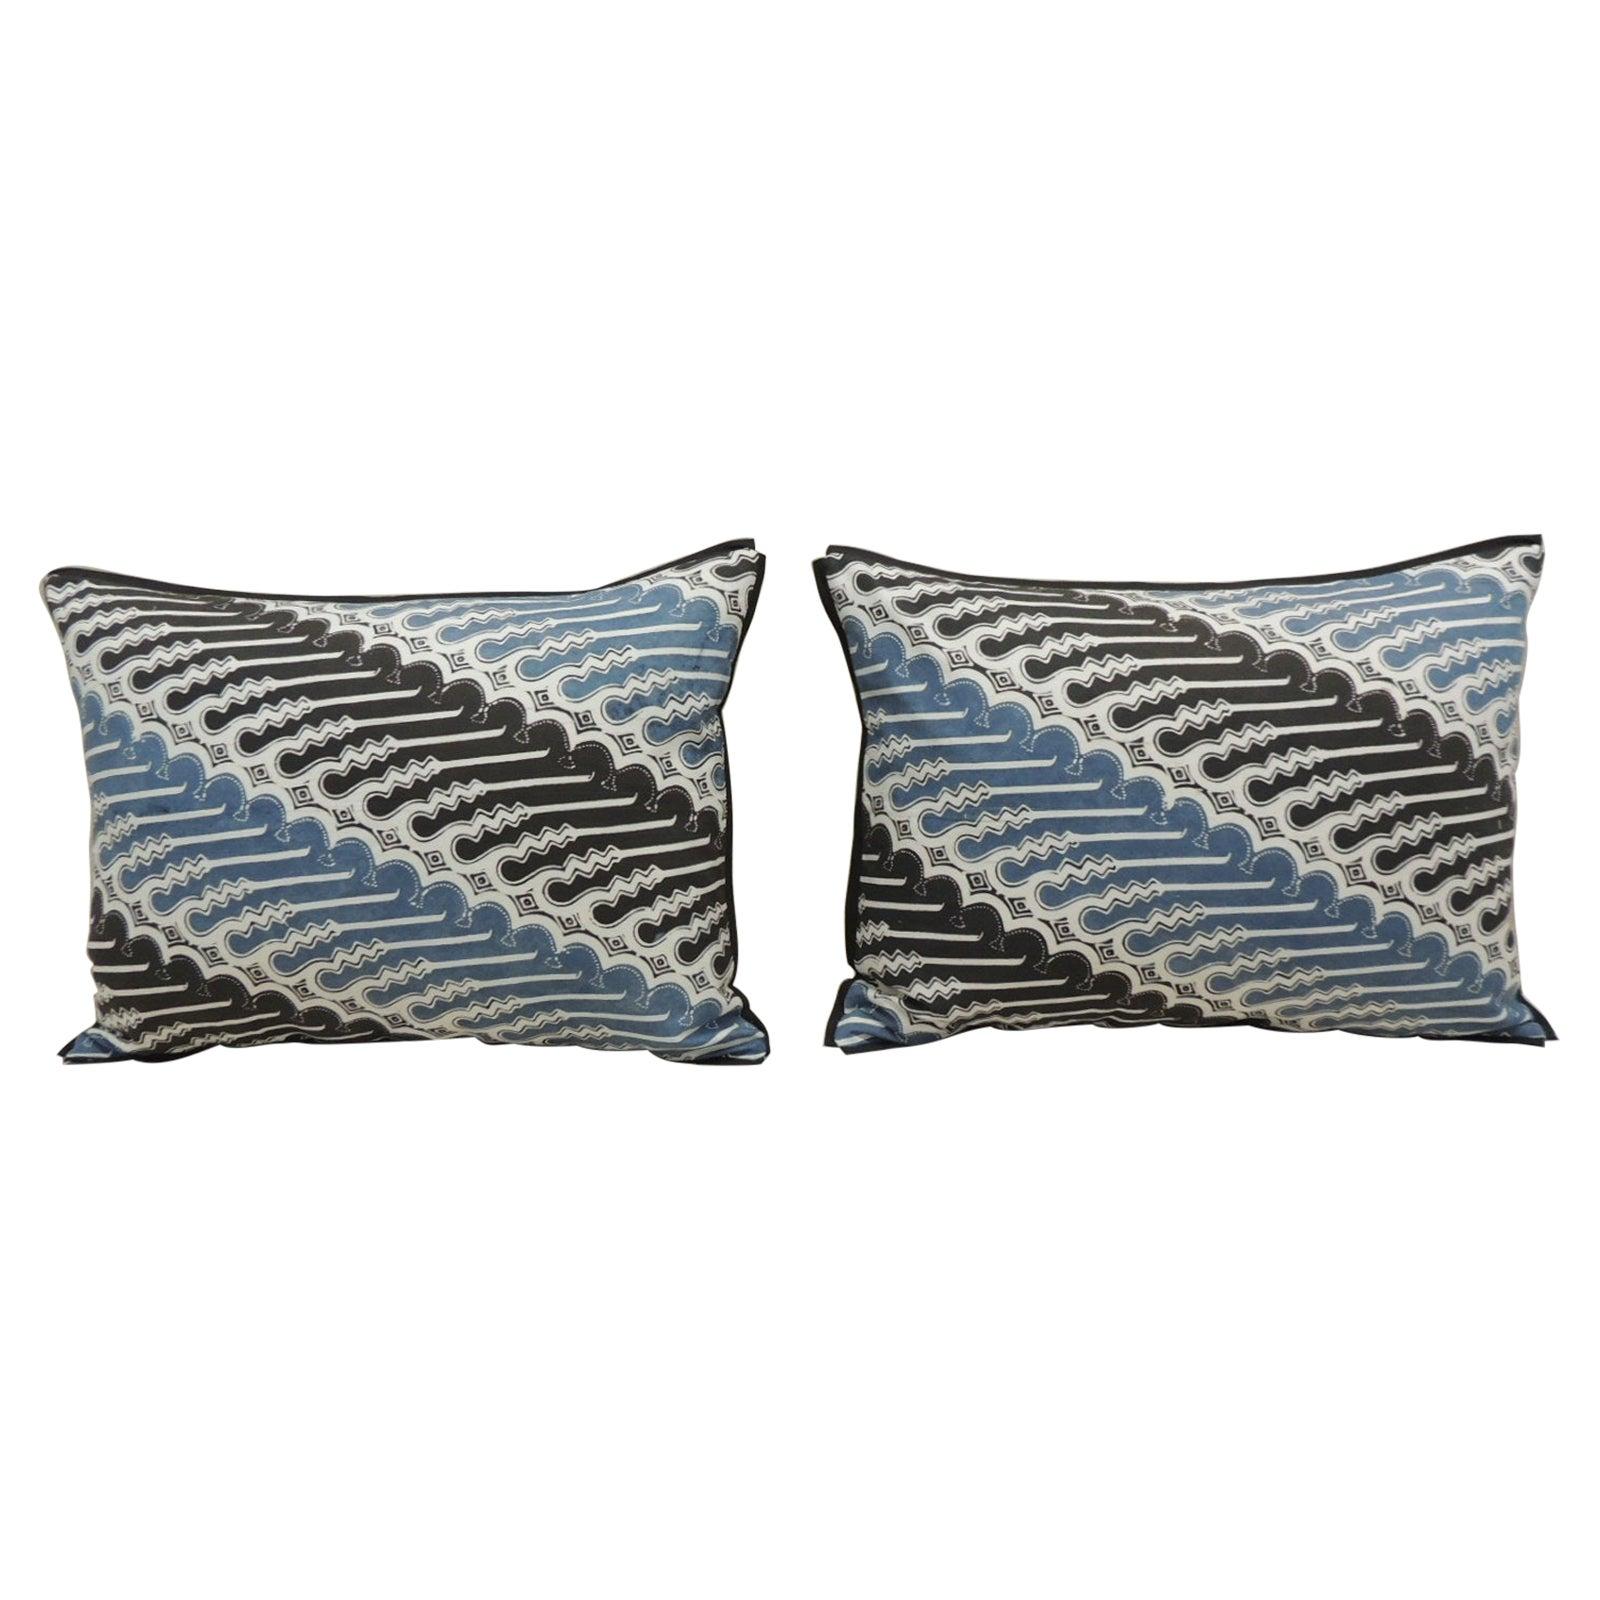 Pair of Vintage Blue and Black Hand-Blocked Batik Decorative Bolster Pillows